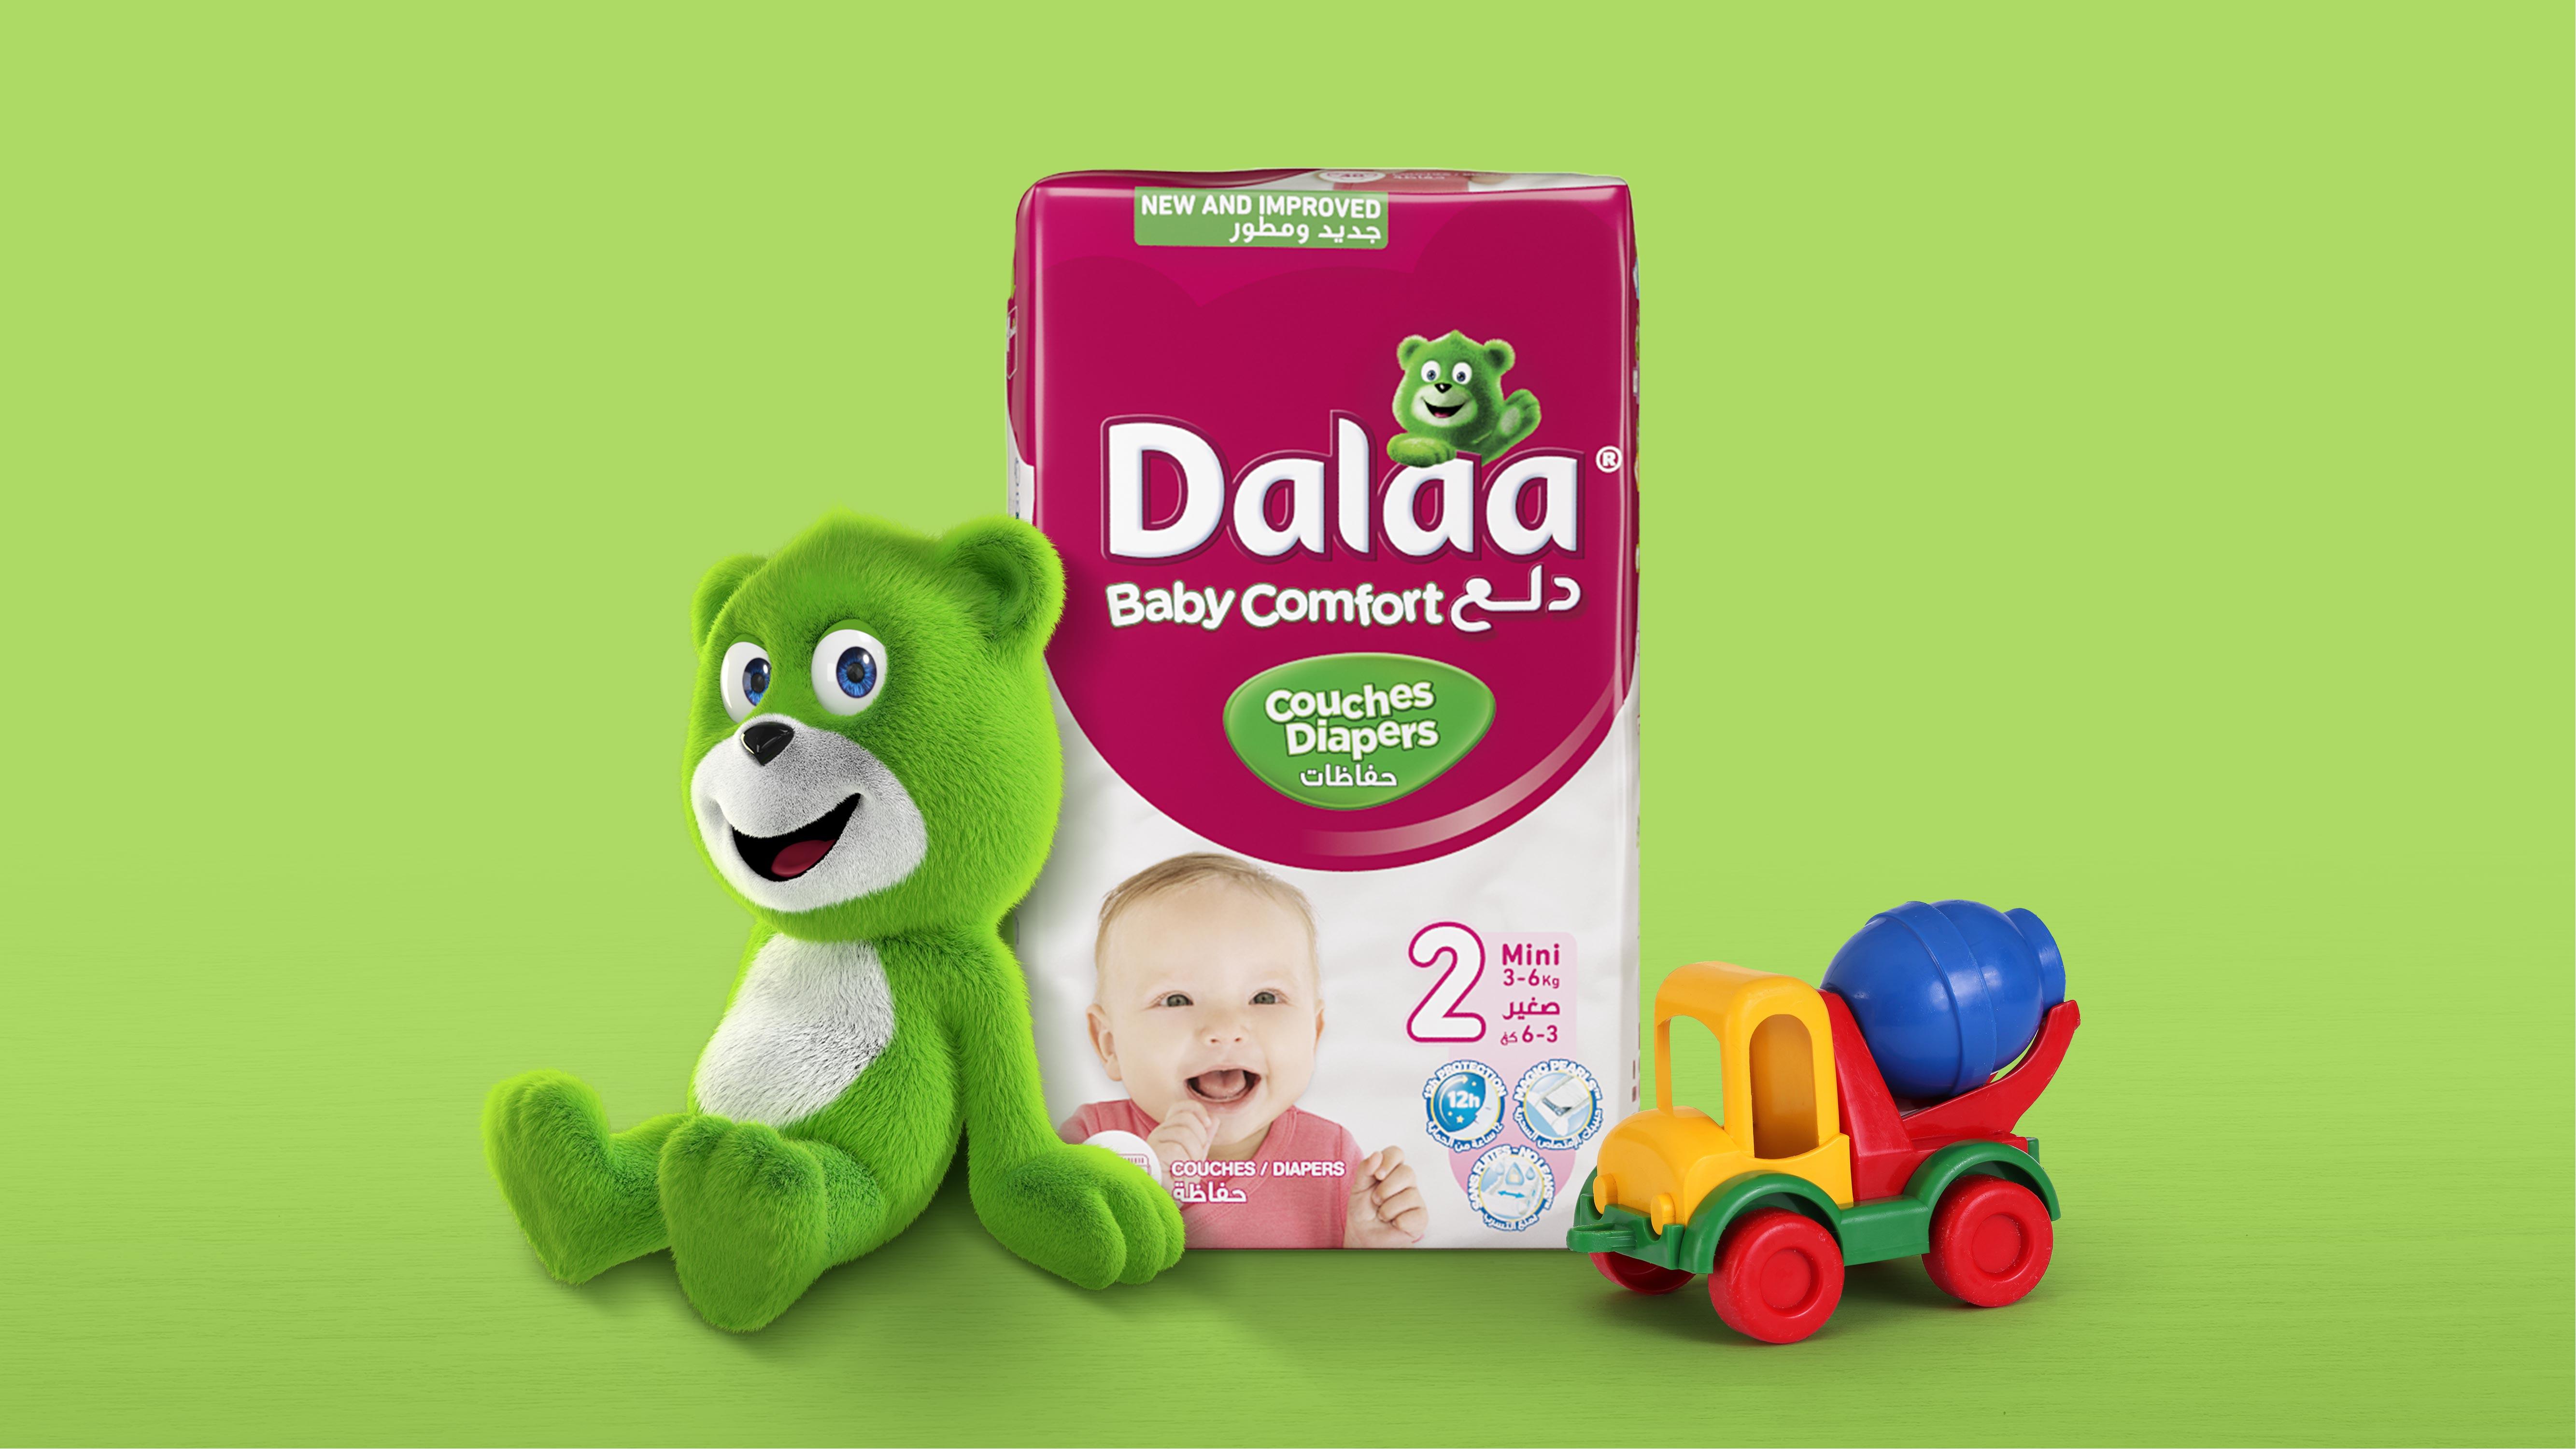 Pointbleu Design Developed New 3D-Renders for Dalaa's Mascot